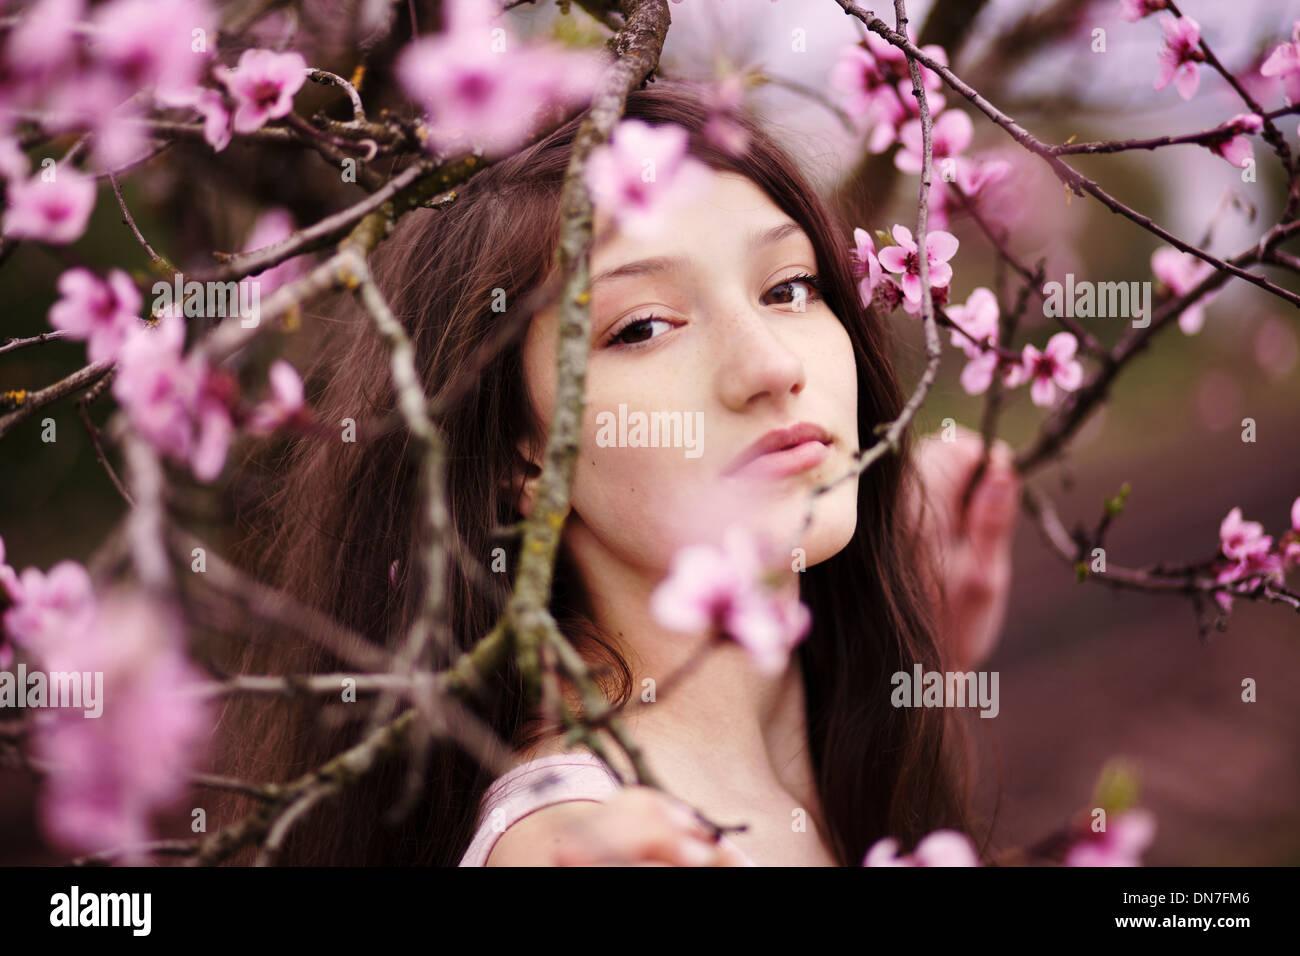 Chica con flores de cerezo, Retrato Imagen De Stock